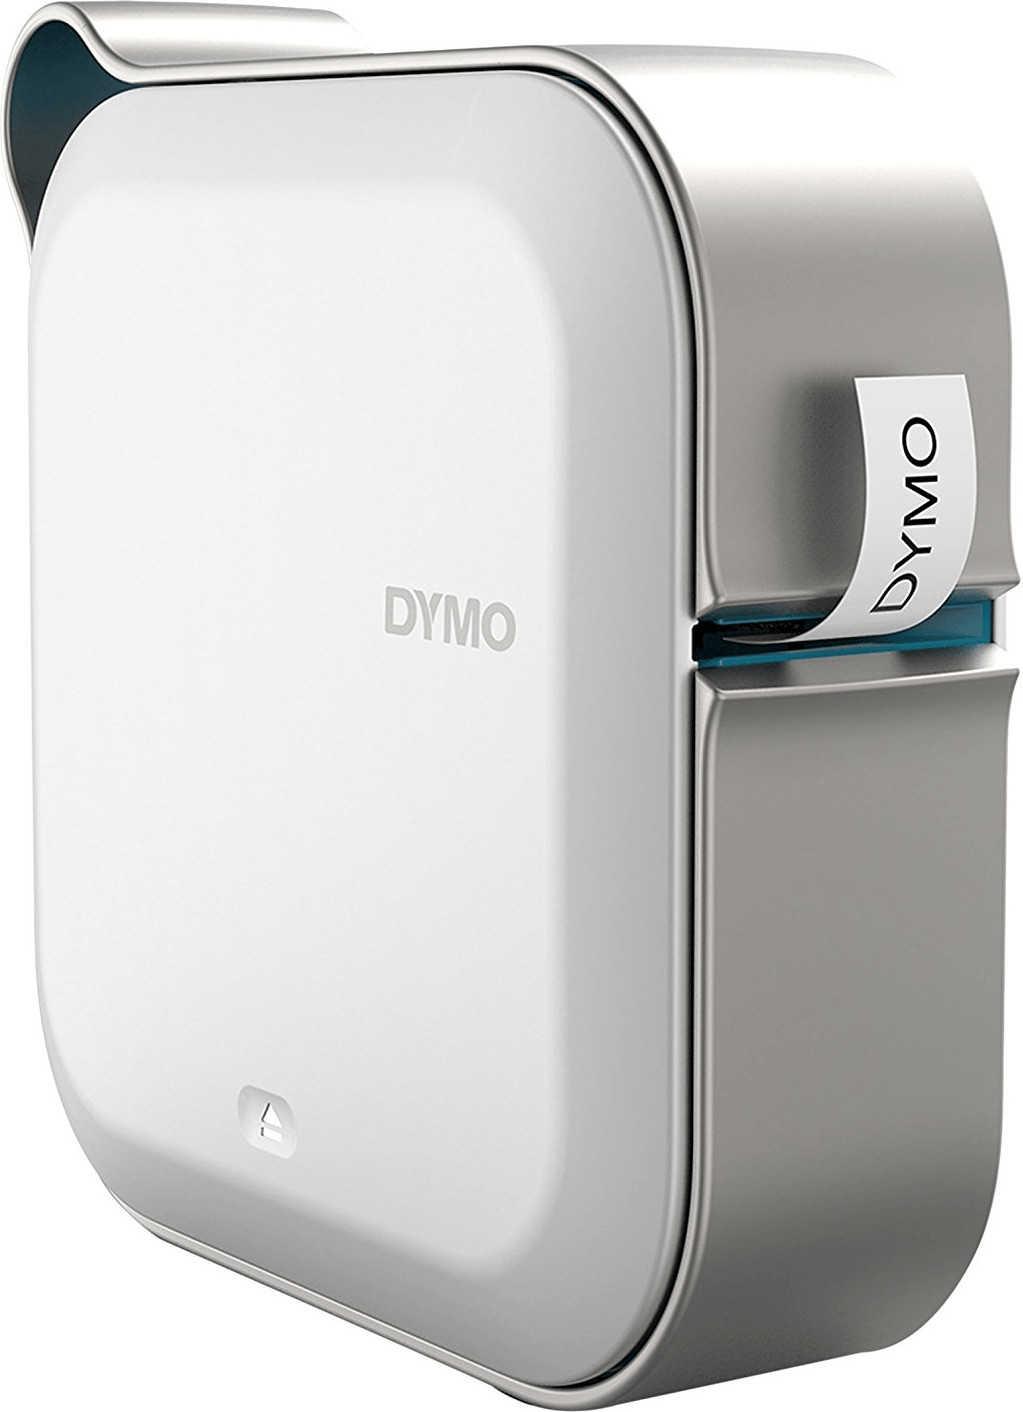 dymo-mobilelabeler